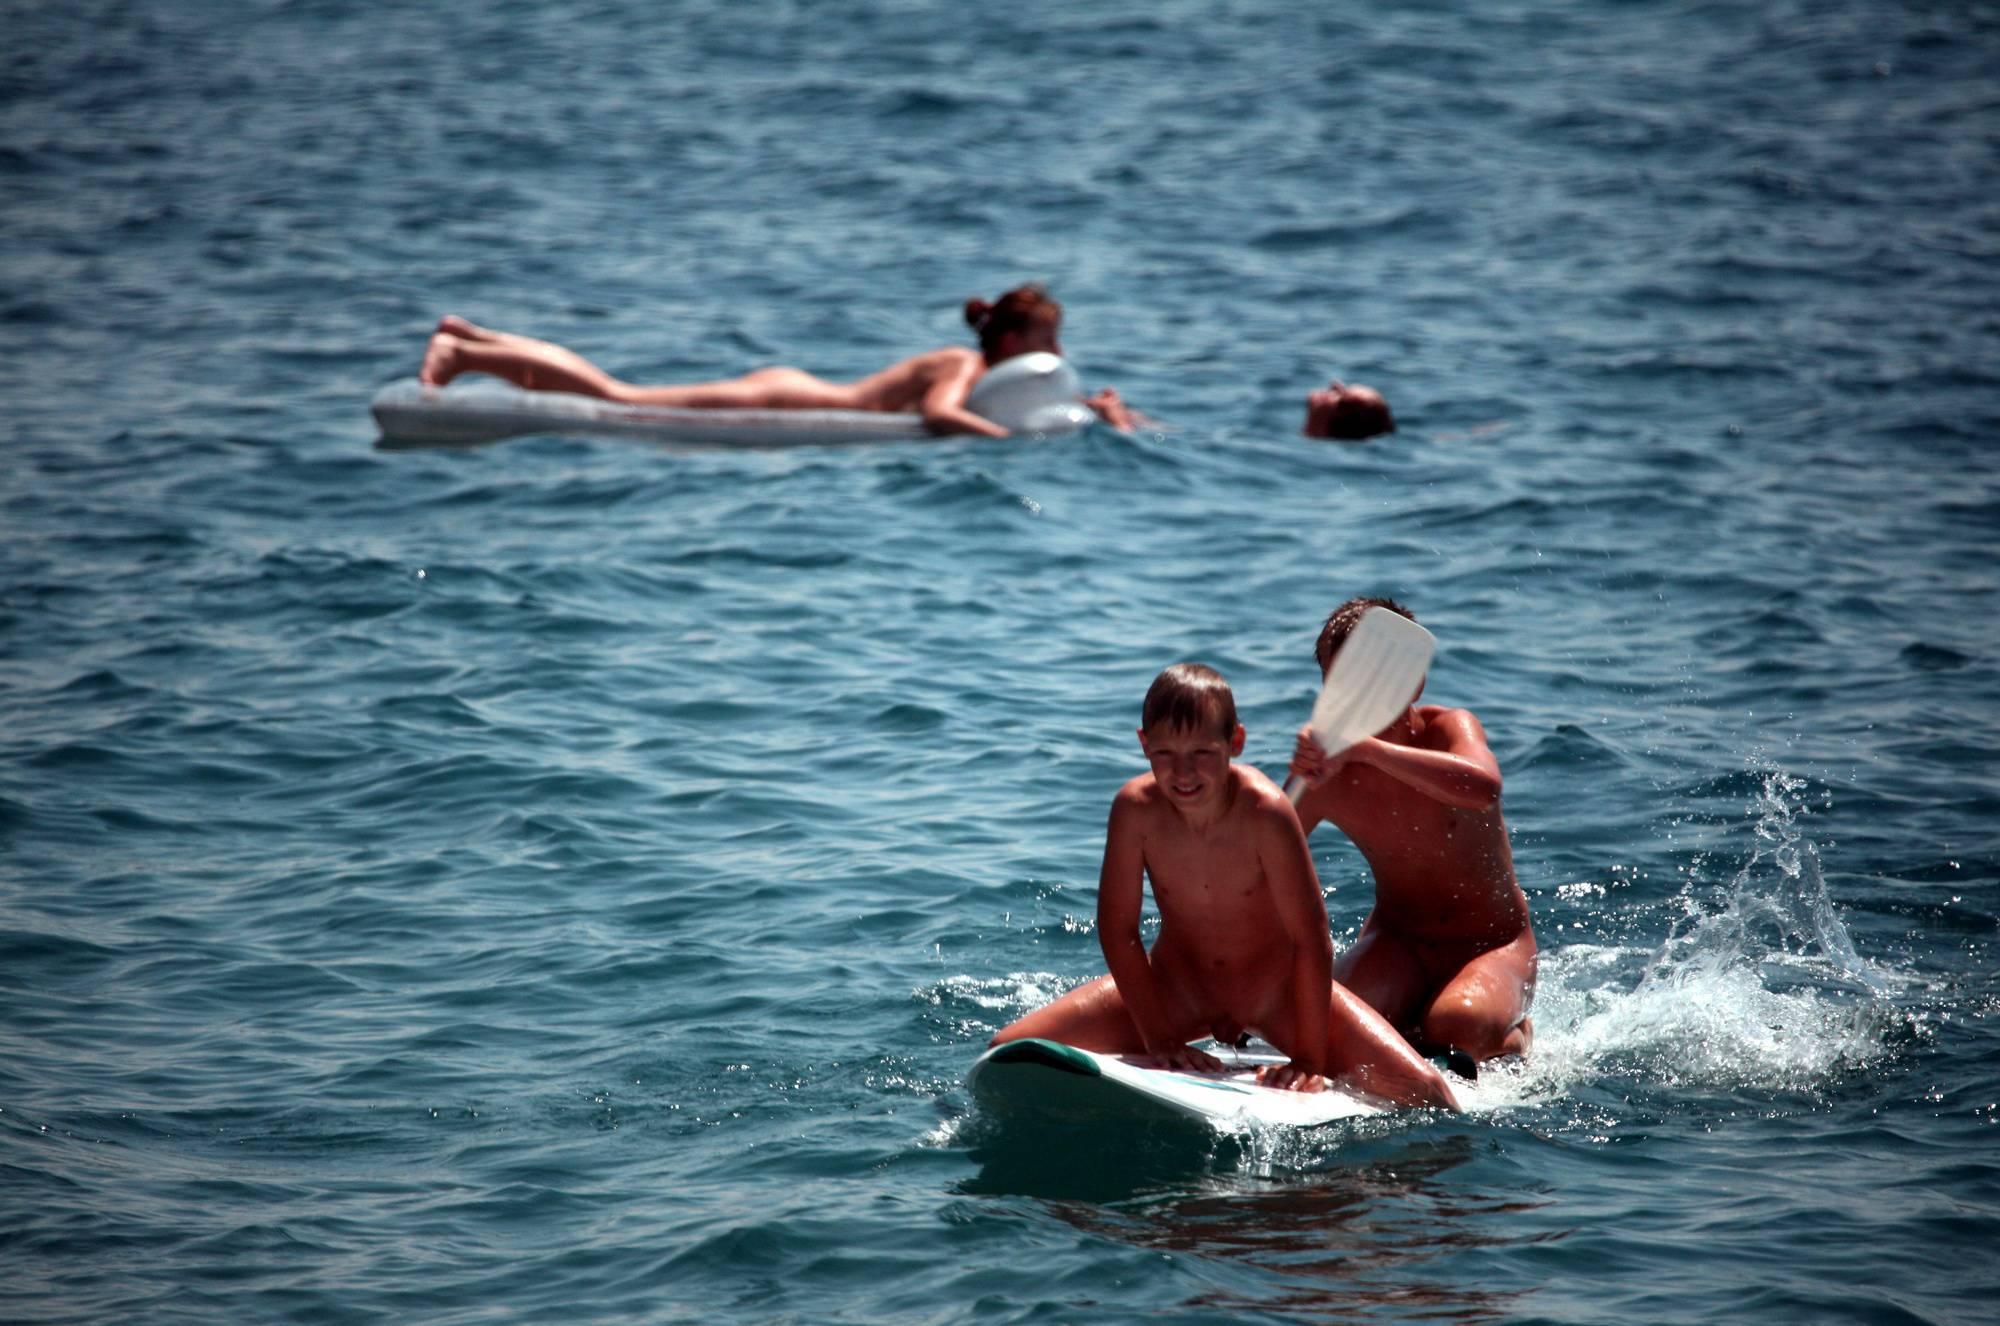 Nudist Photos Boys Nudist Water Surfing - 2